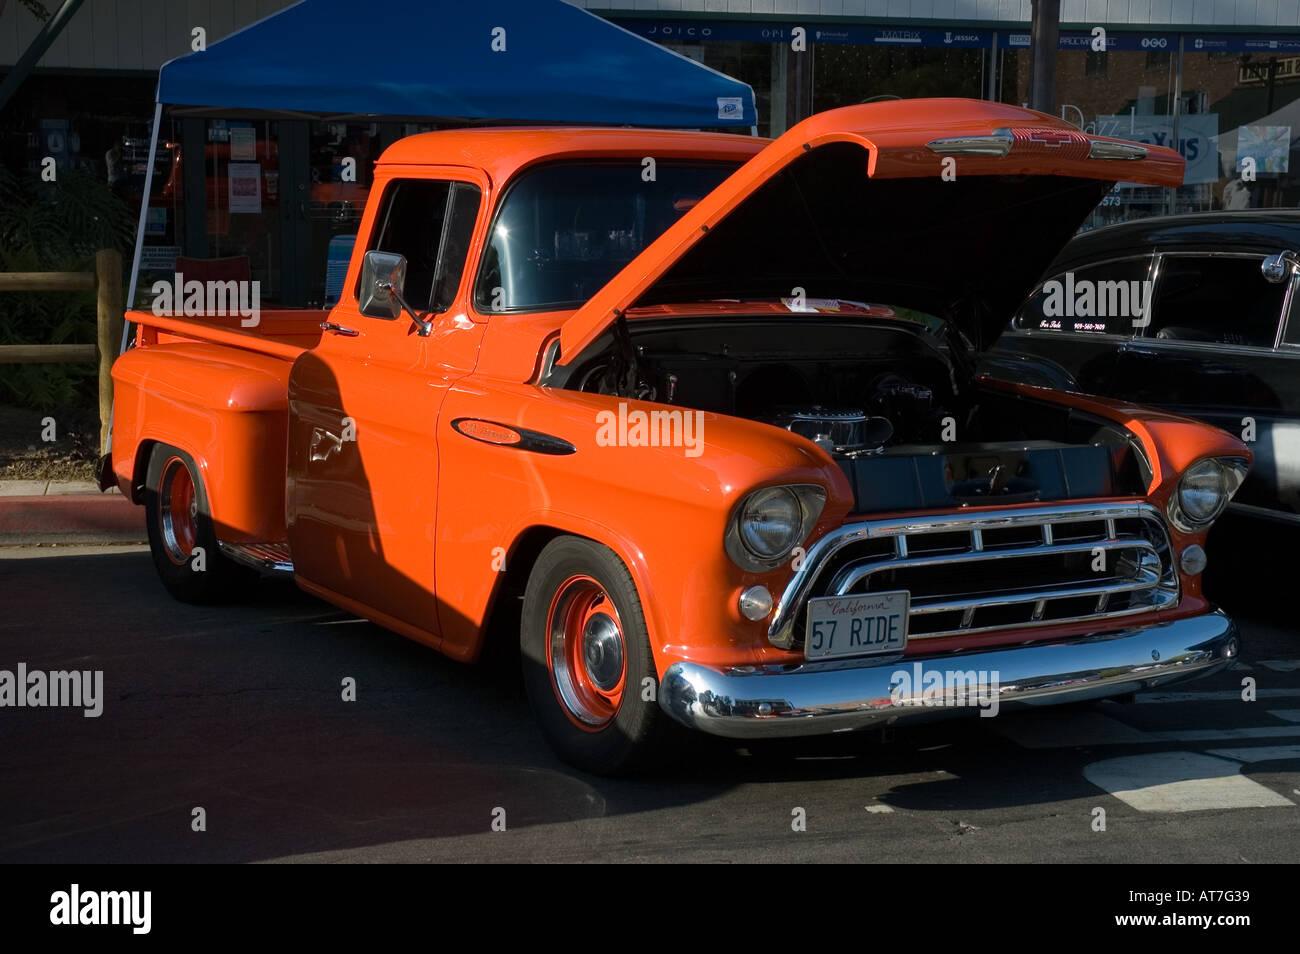 Los angeles california car show antique customized 1957 57 chevy chevrolet pickup truck 3100 orange